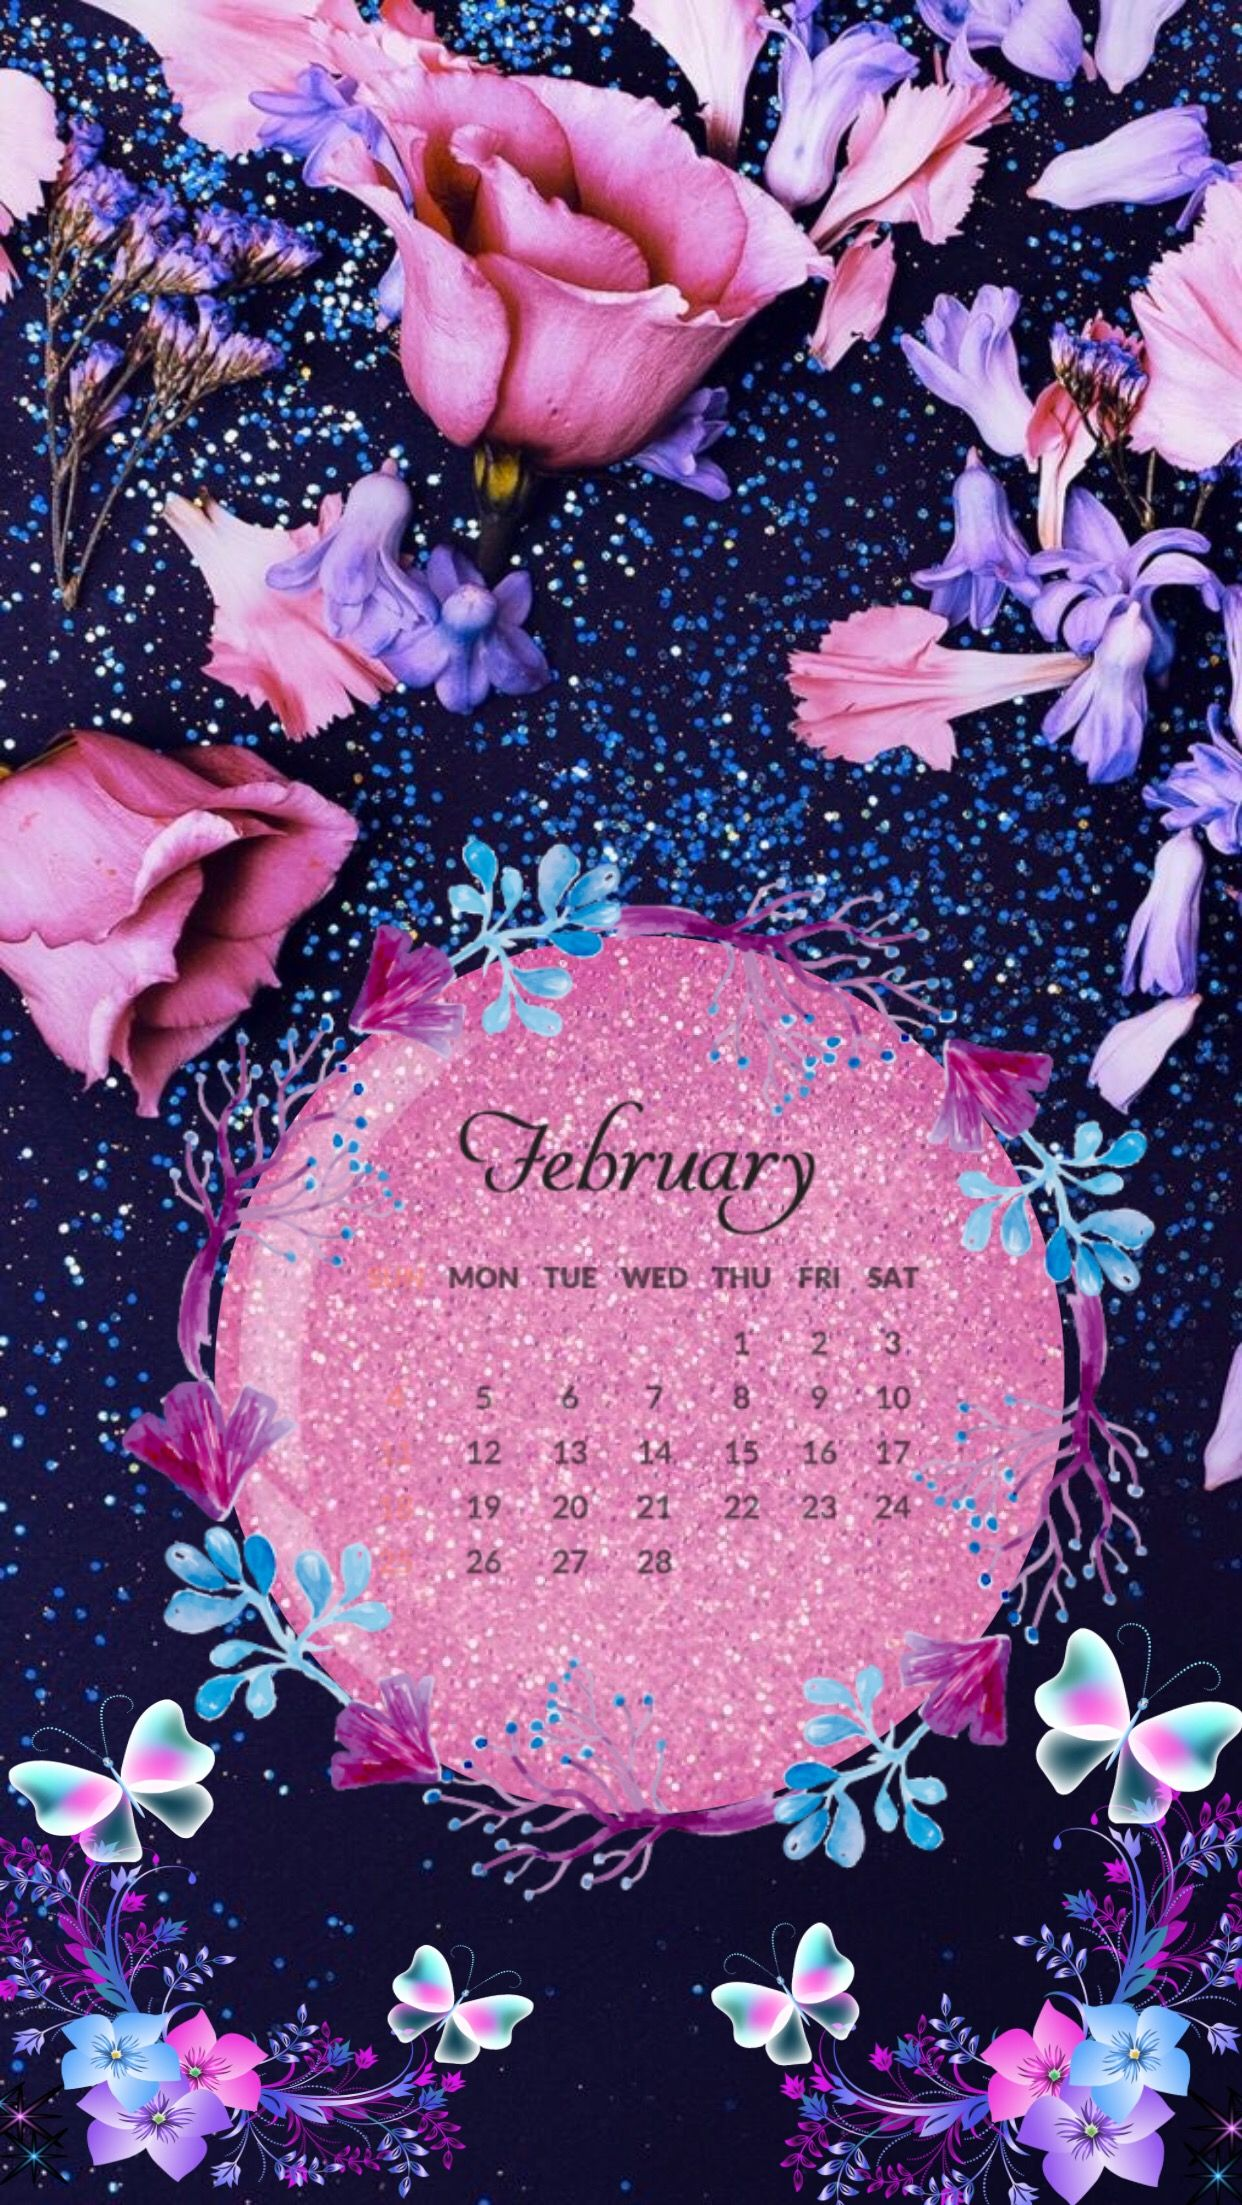 February IPhone calendar wallpaper iphonewallpaper iphoneography